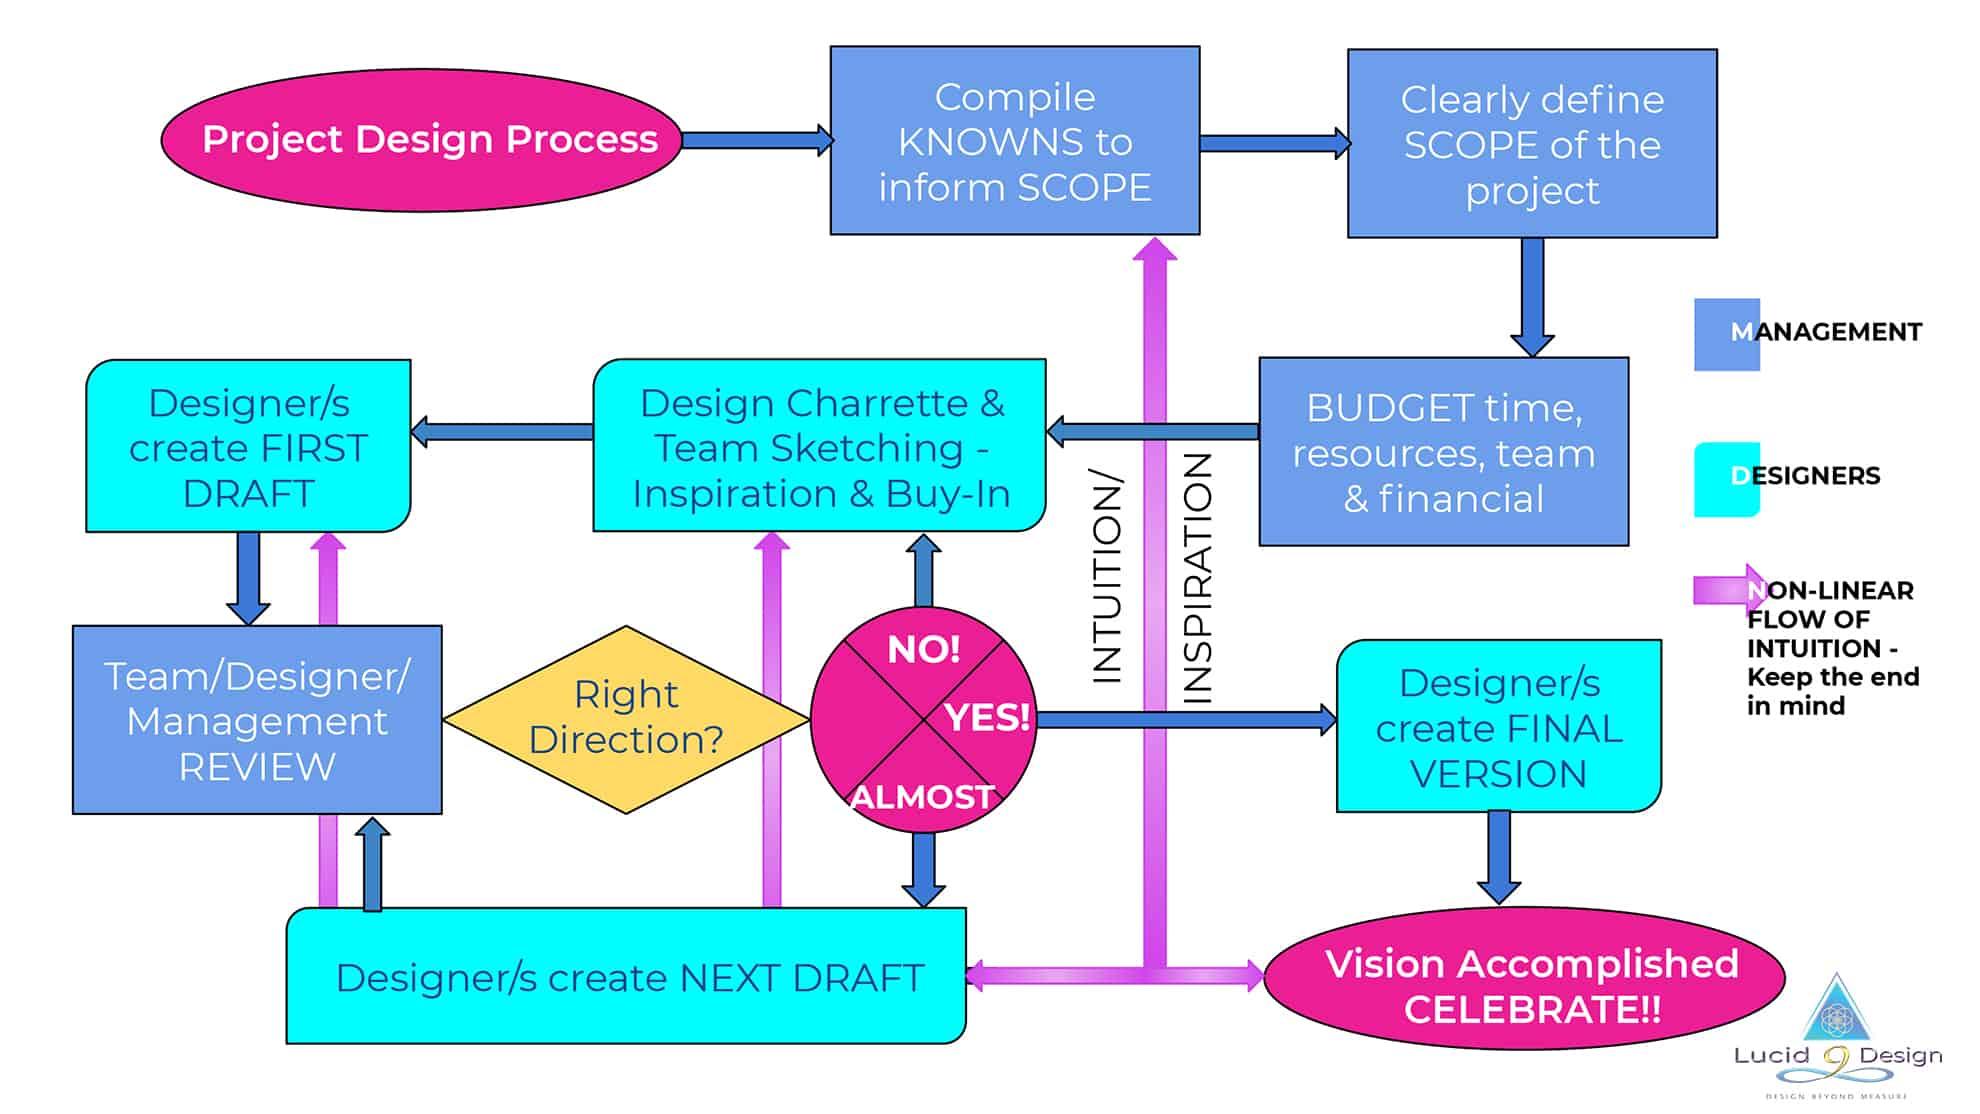 Lucid 9 Design - Design process